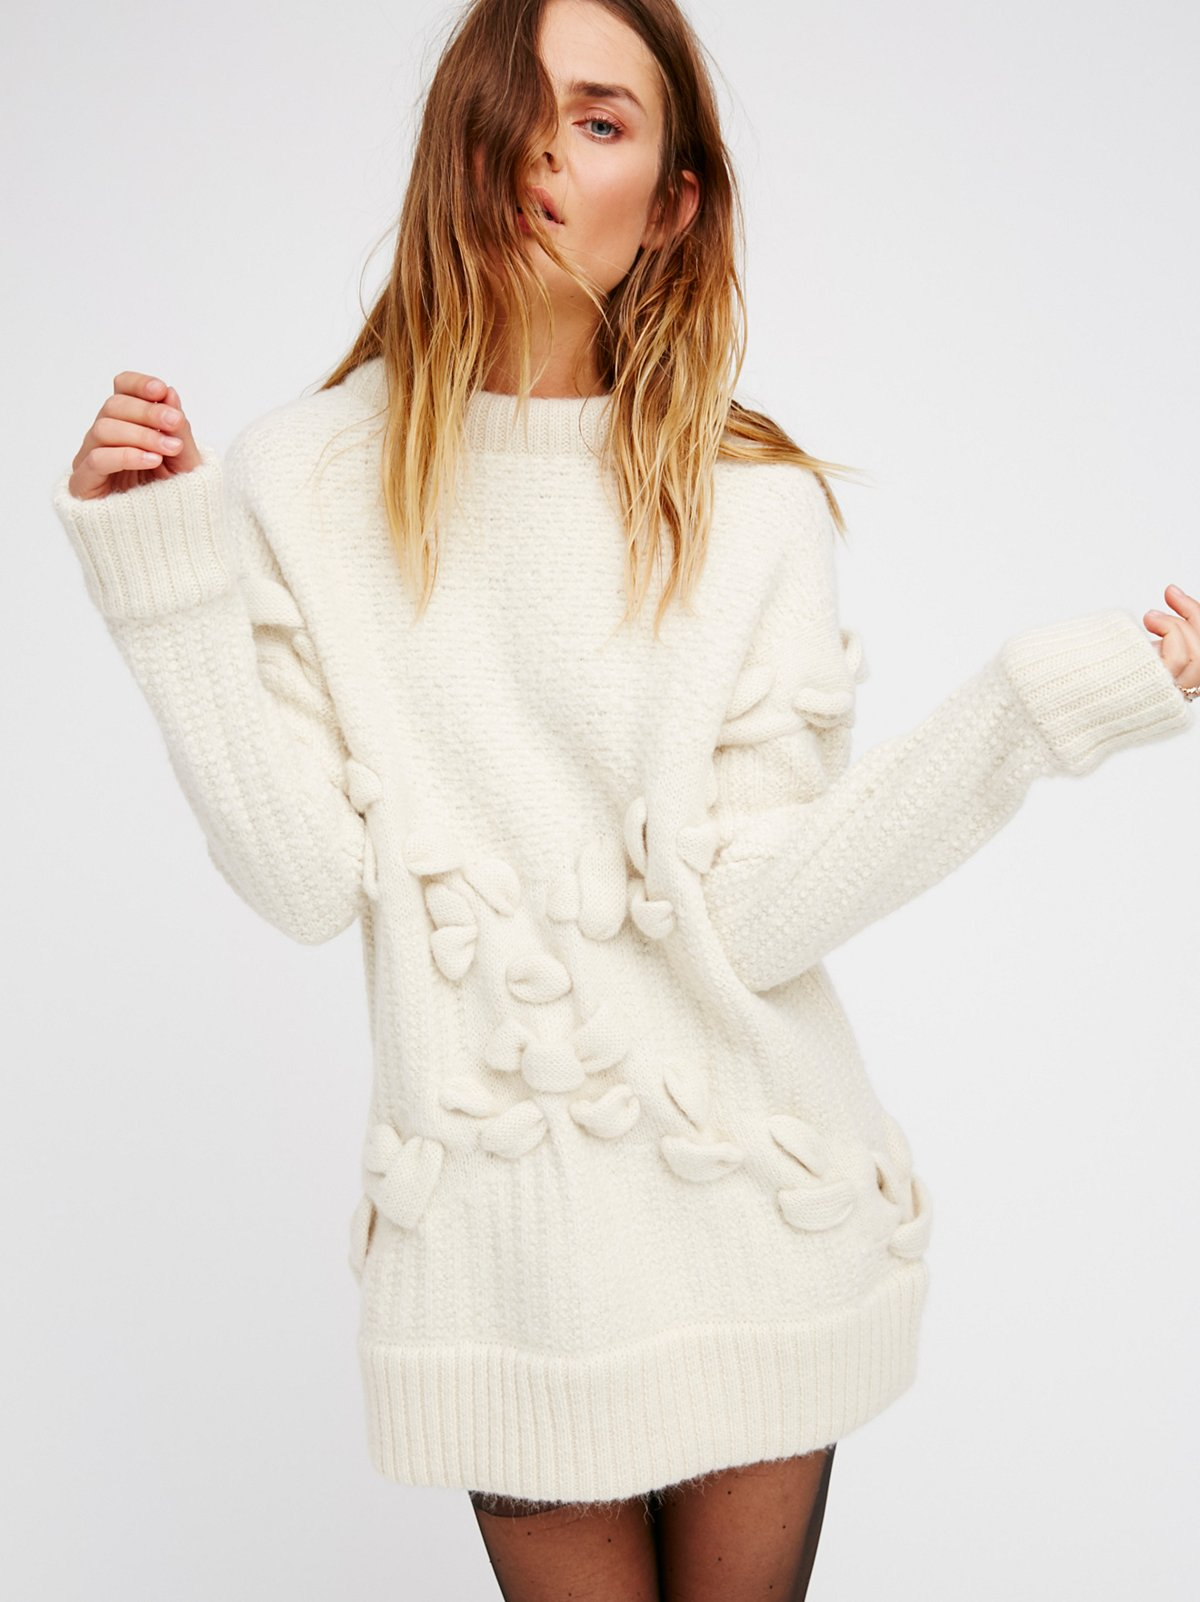 Edit Knit Sweater Jacket